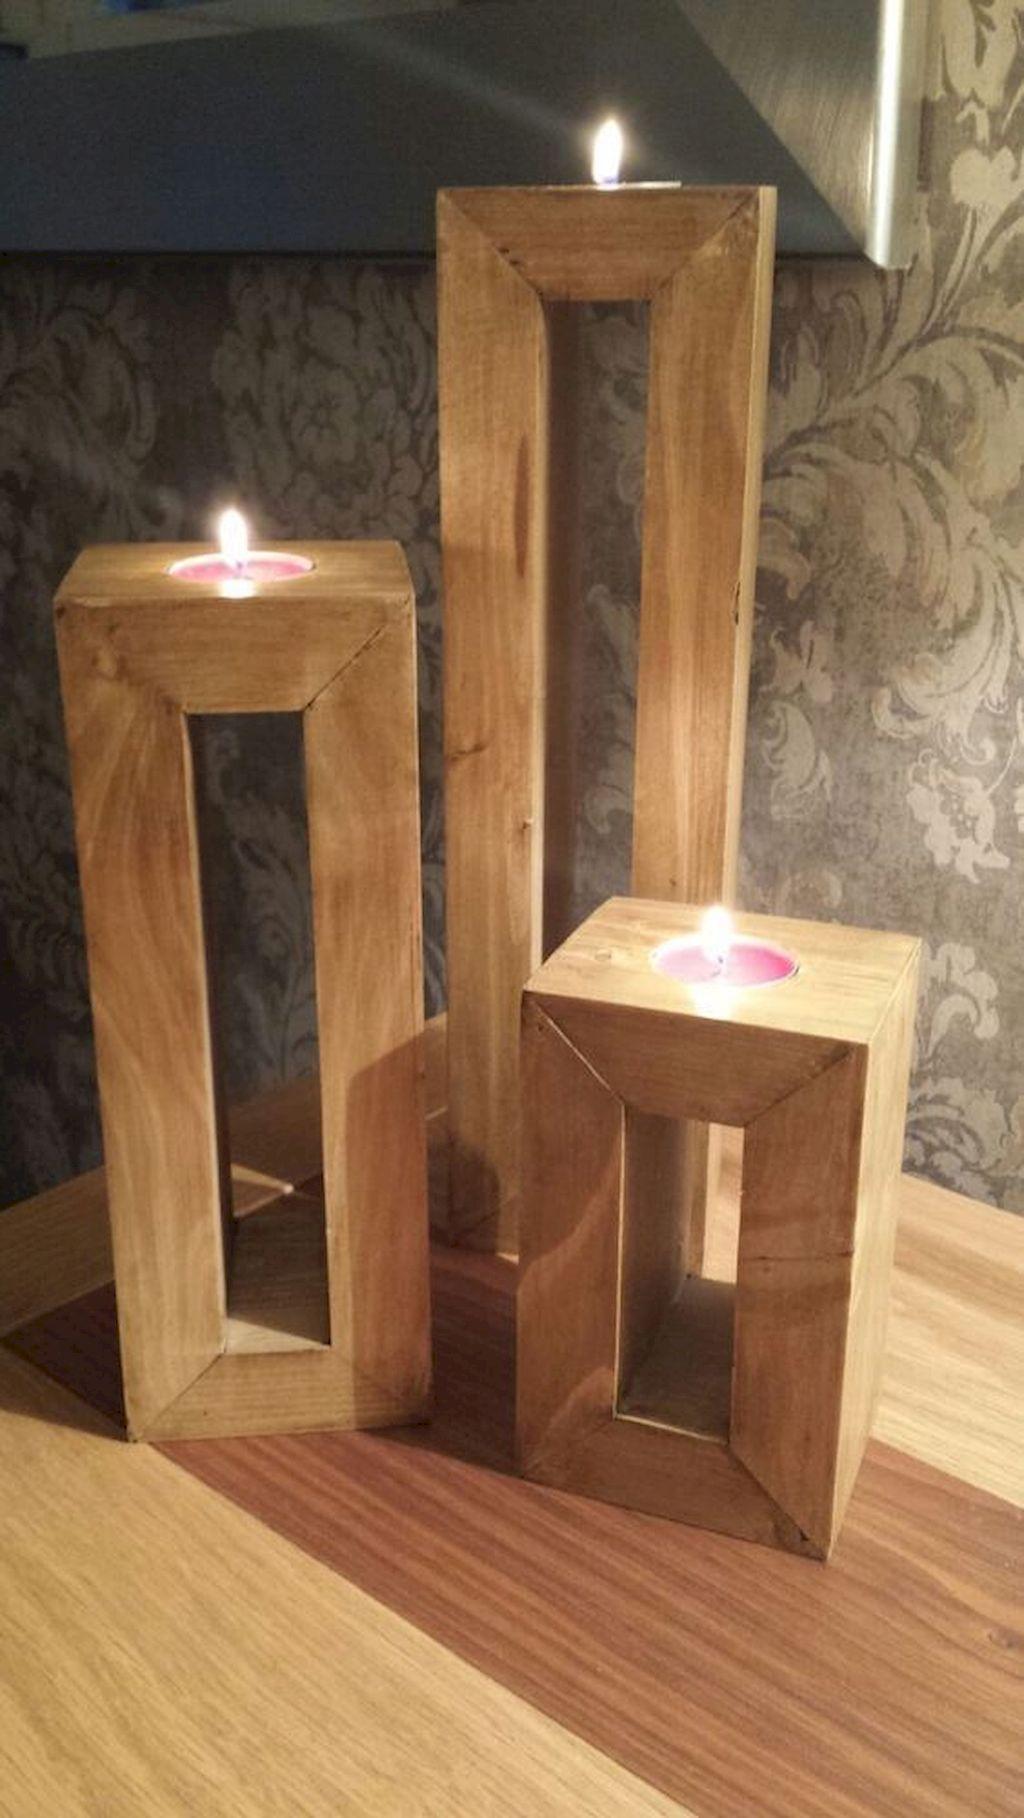 Easy Diy Wood Projects Ideas Beginner 18